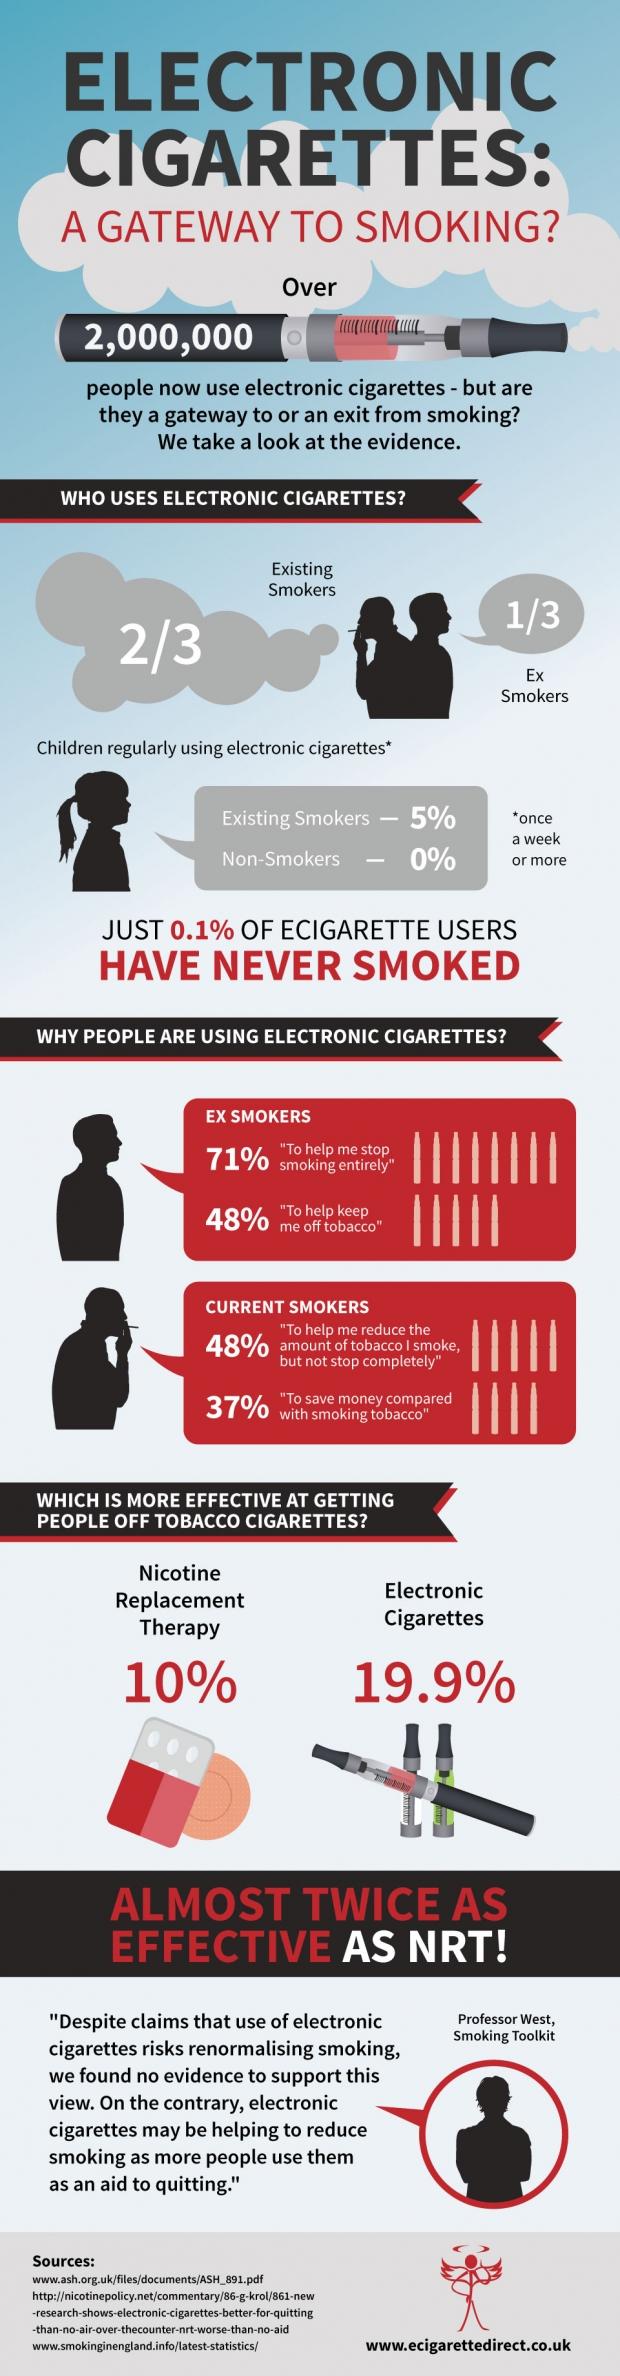 960.Ecigarettes-Gateway